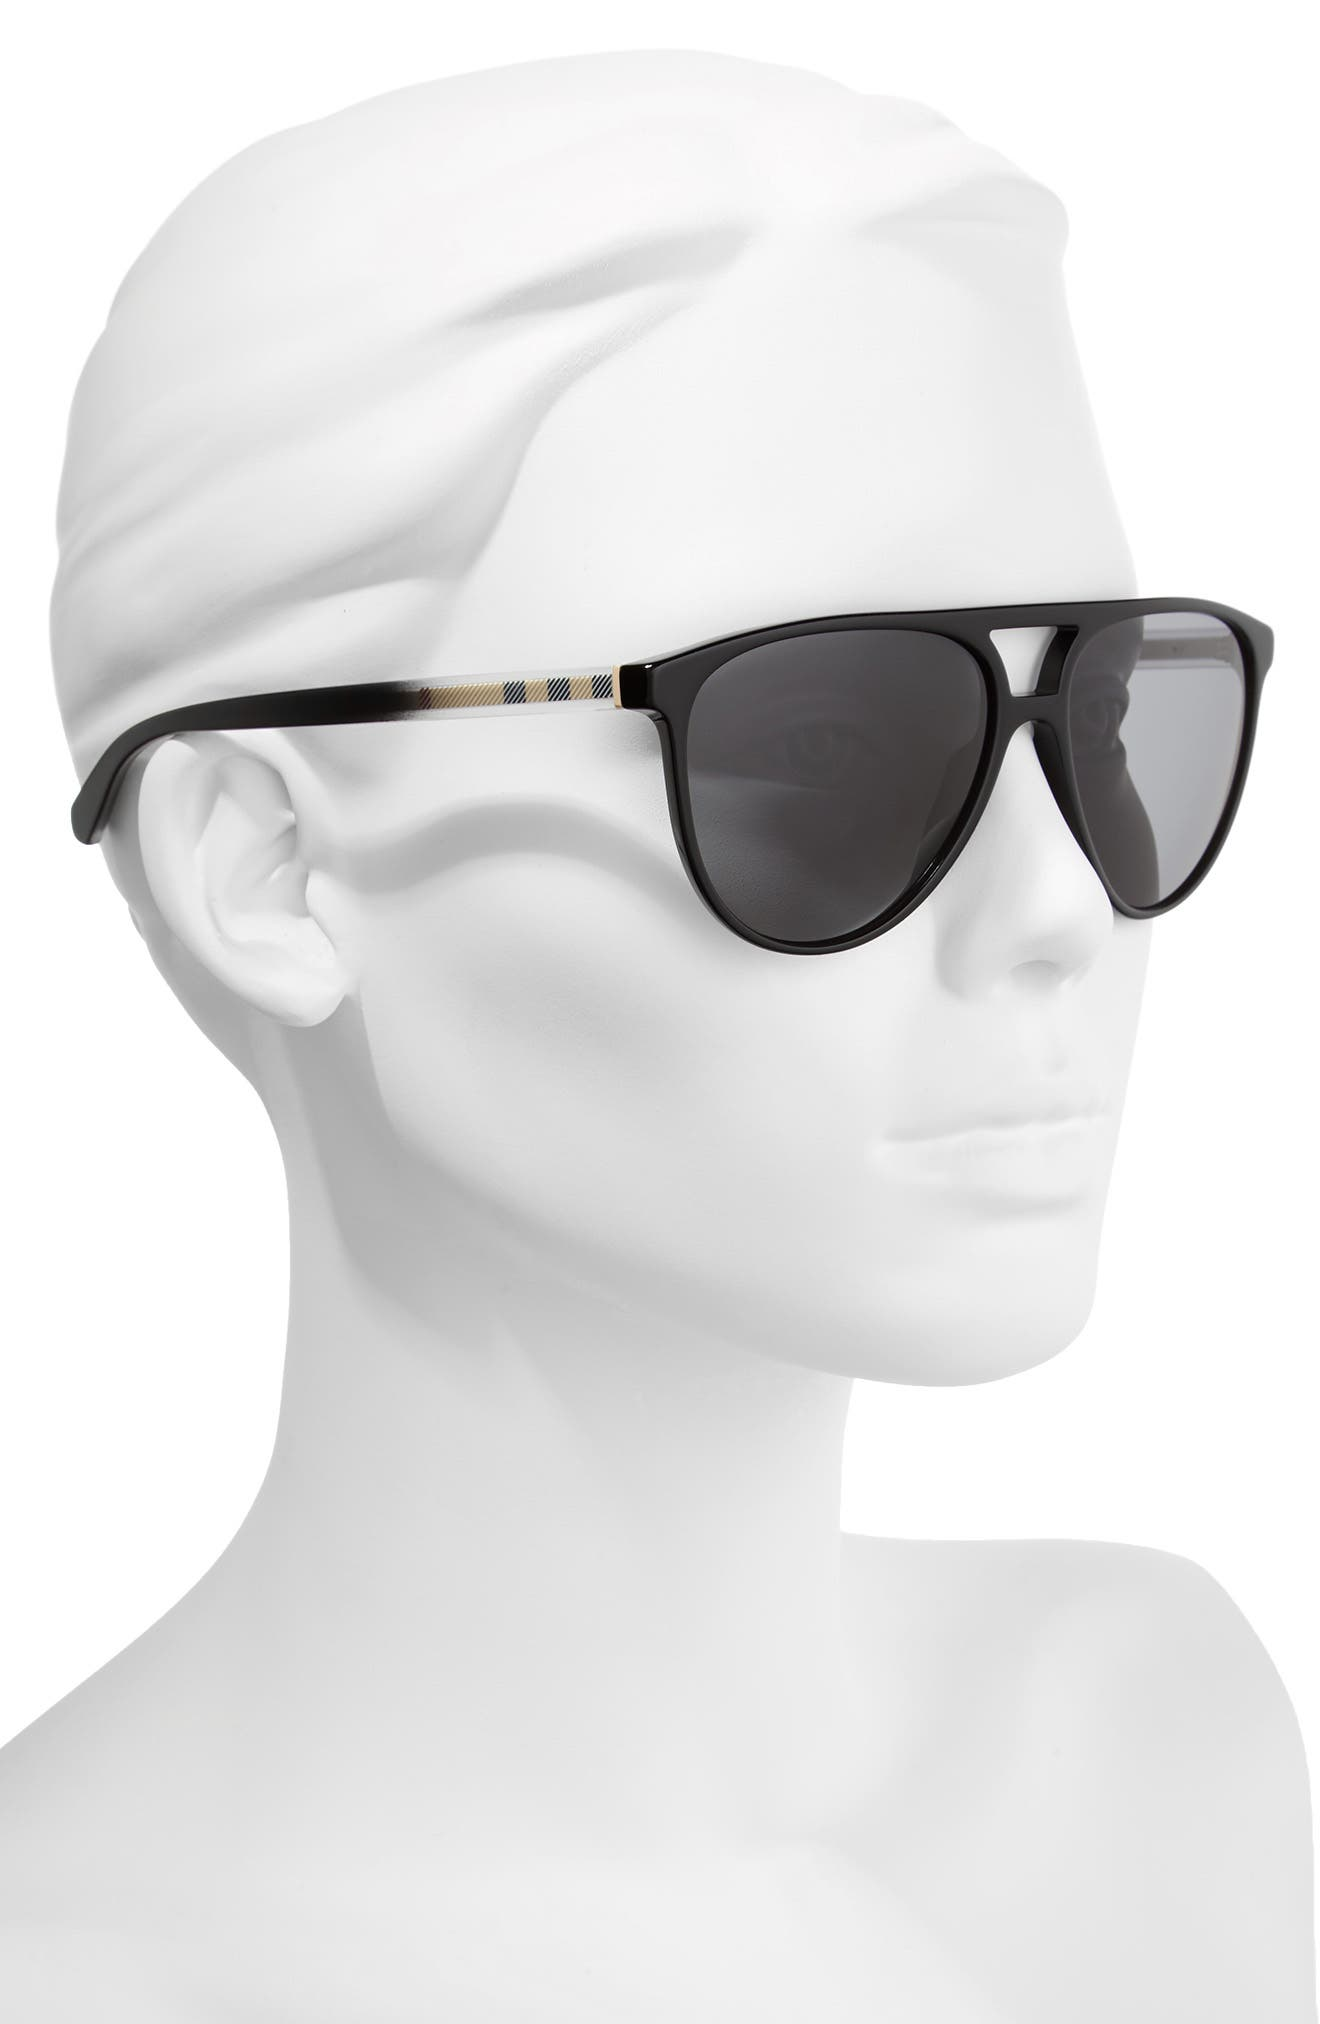 58mm Polarized Aviator Sunglasses,                             Alternate thumbnail 2, color,                             001